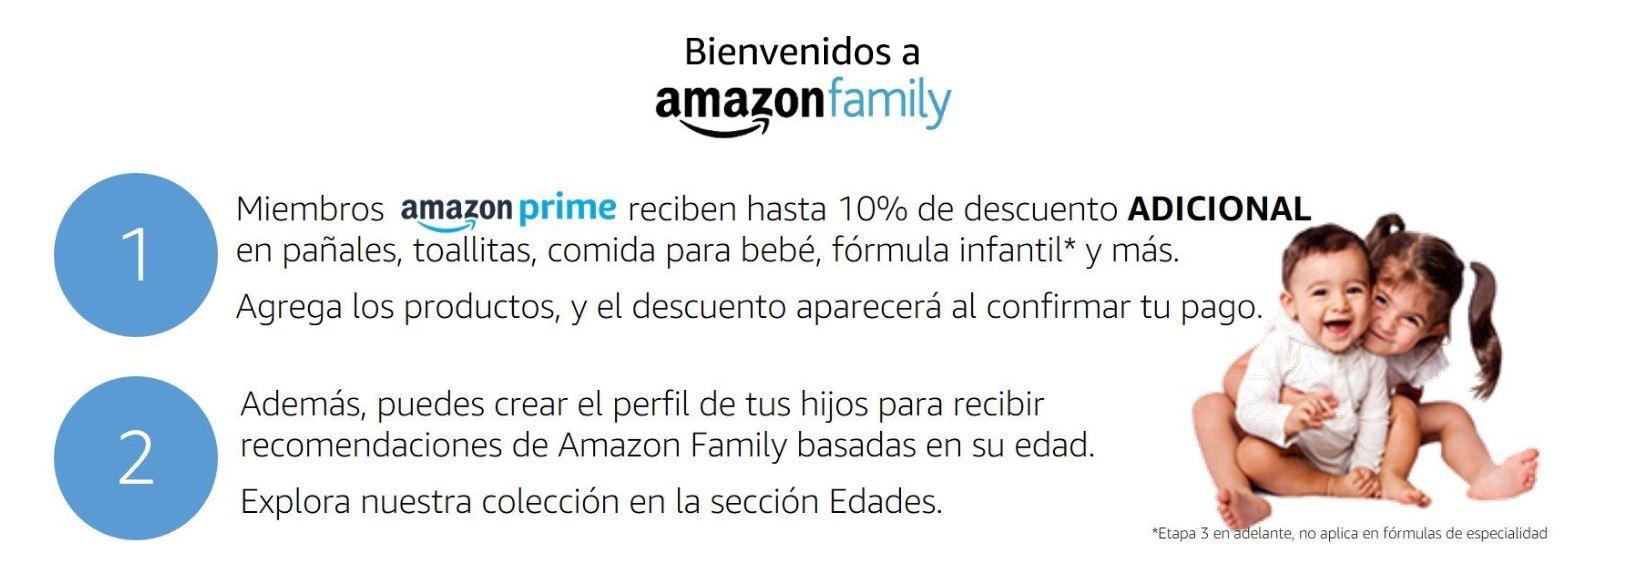 Amazón: 10% adicional para miembros de amazon prime en categoría bebésy descuentos extra